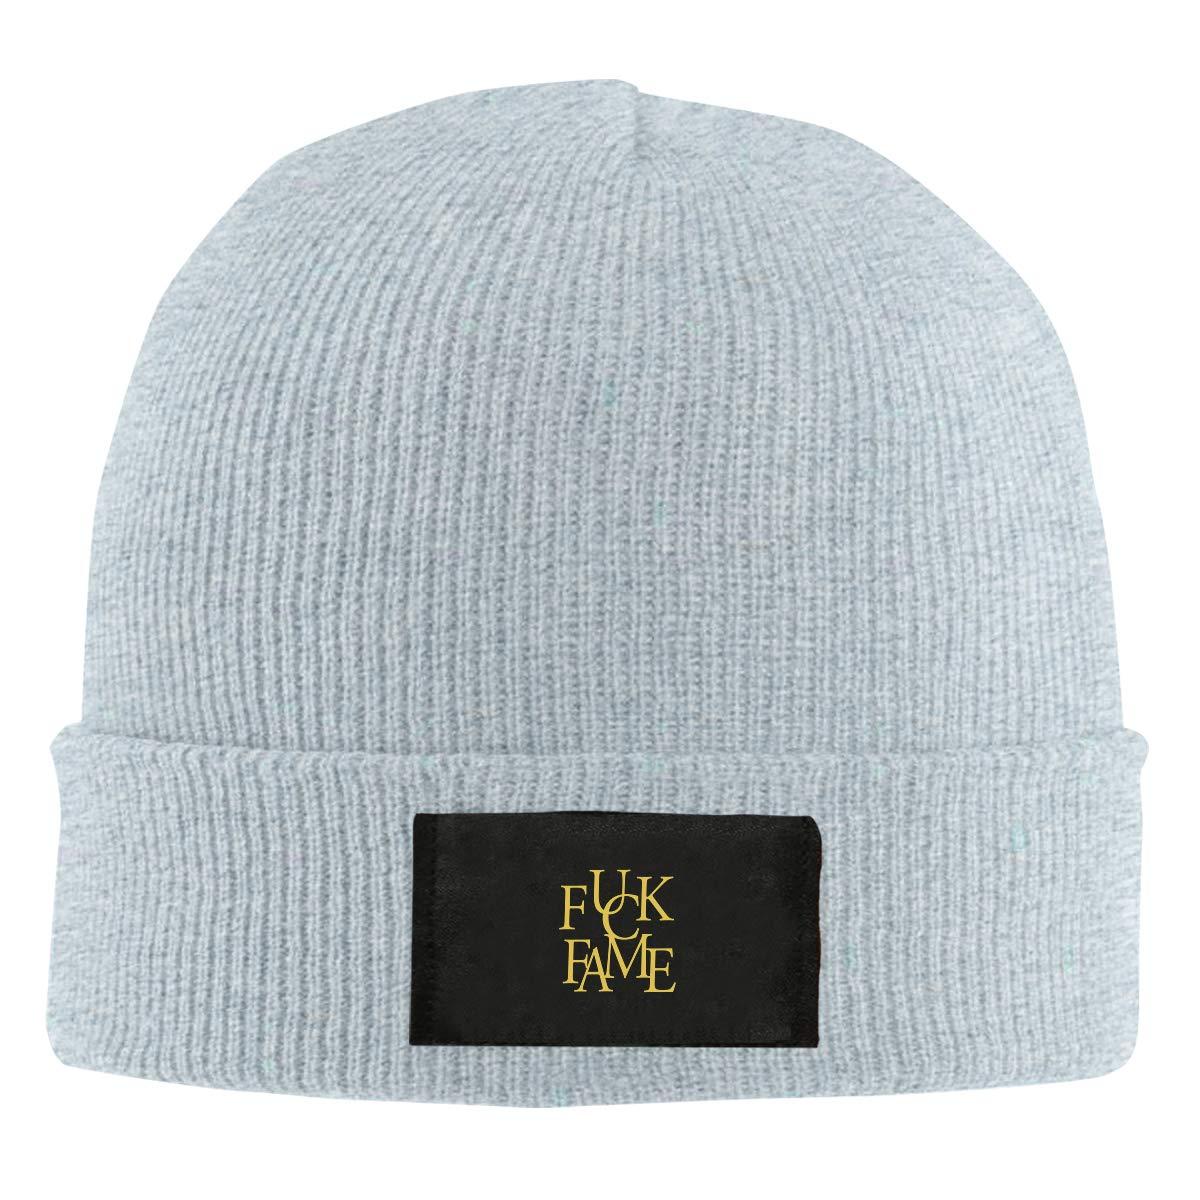 LRHUI Fuck Winter Knitted Hat Warm Wool Skull Beanie Cap